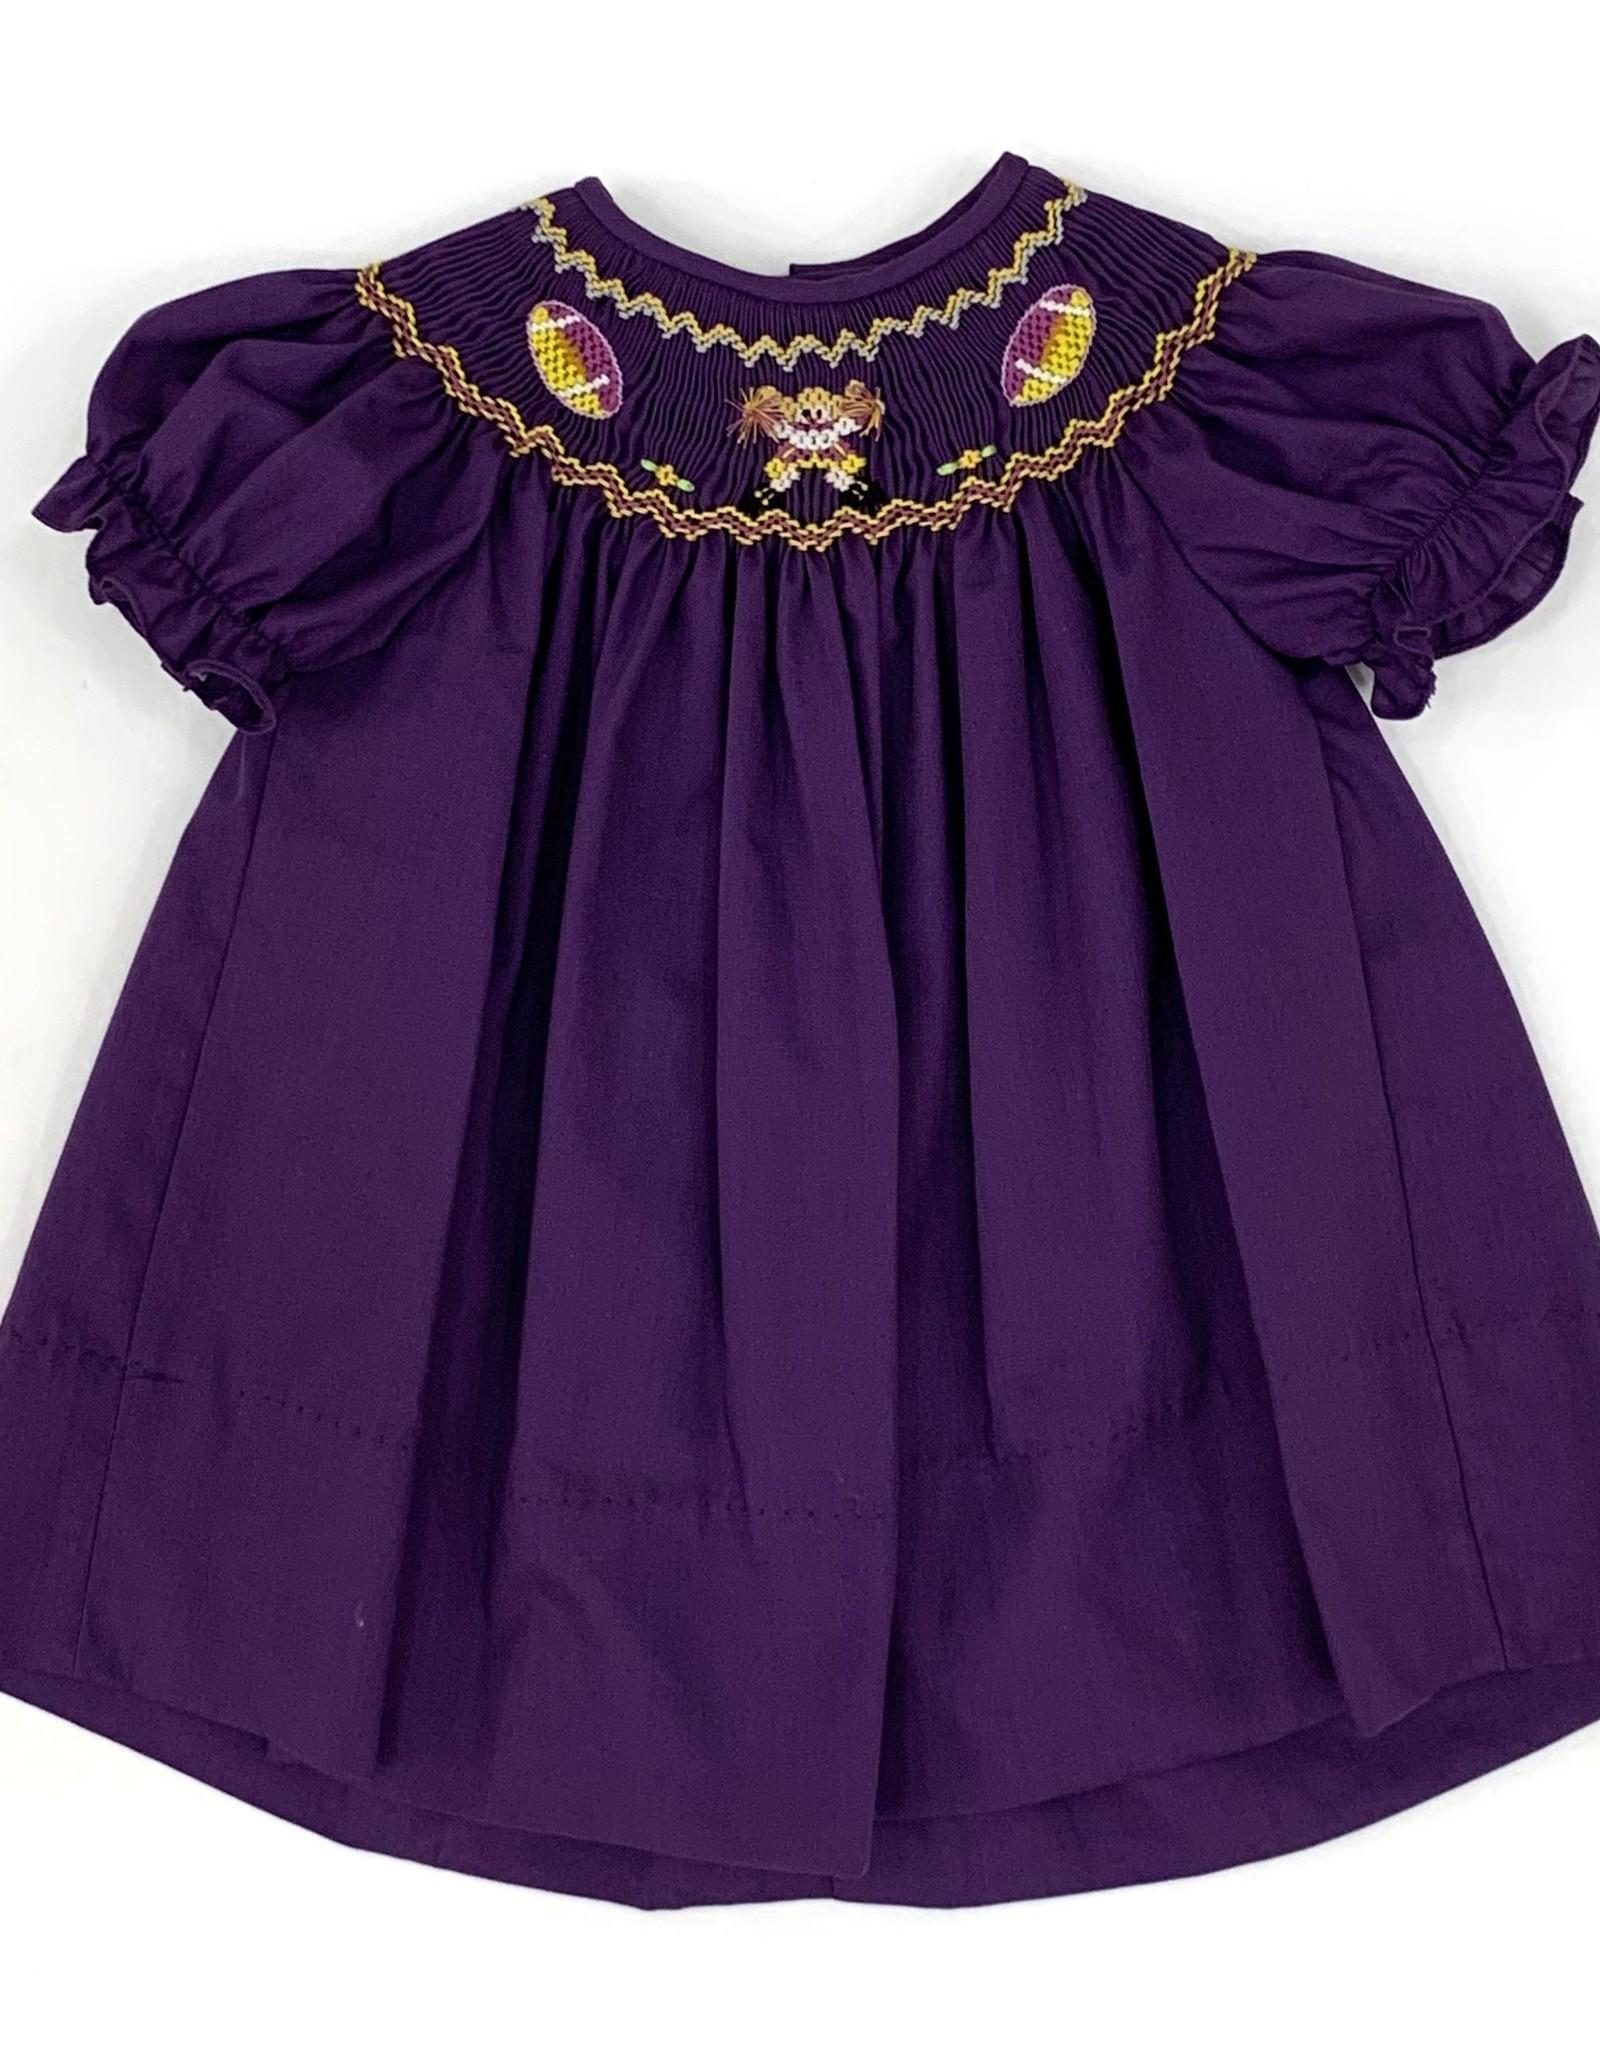 Rosalina Cheerleader Bishop Dress